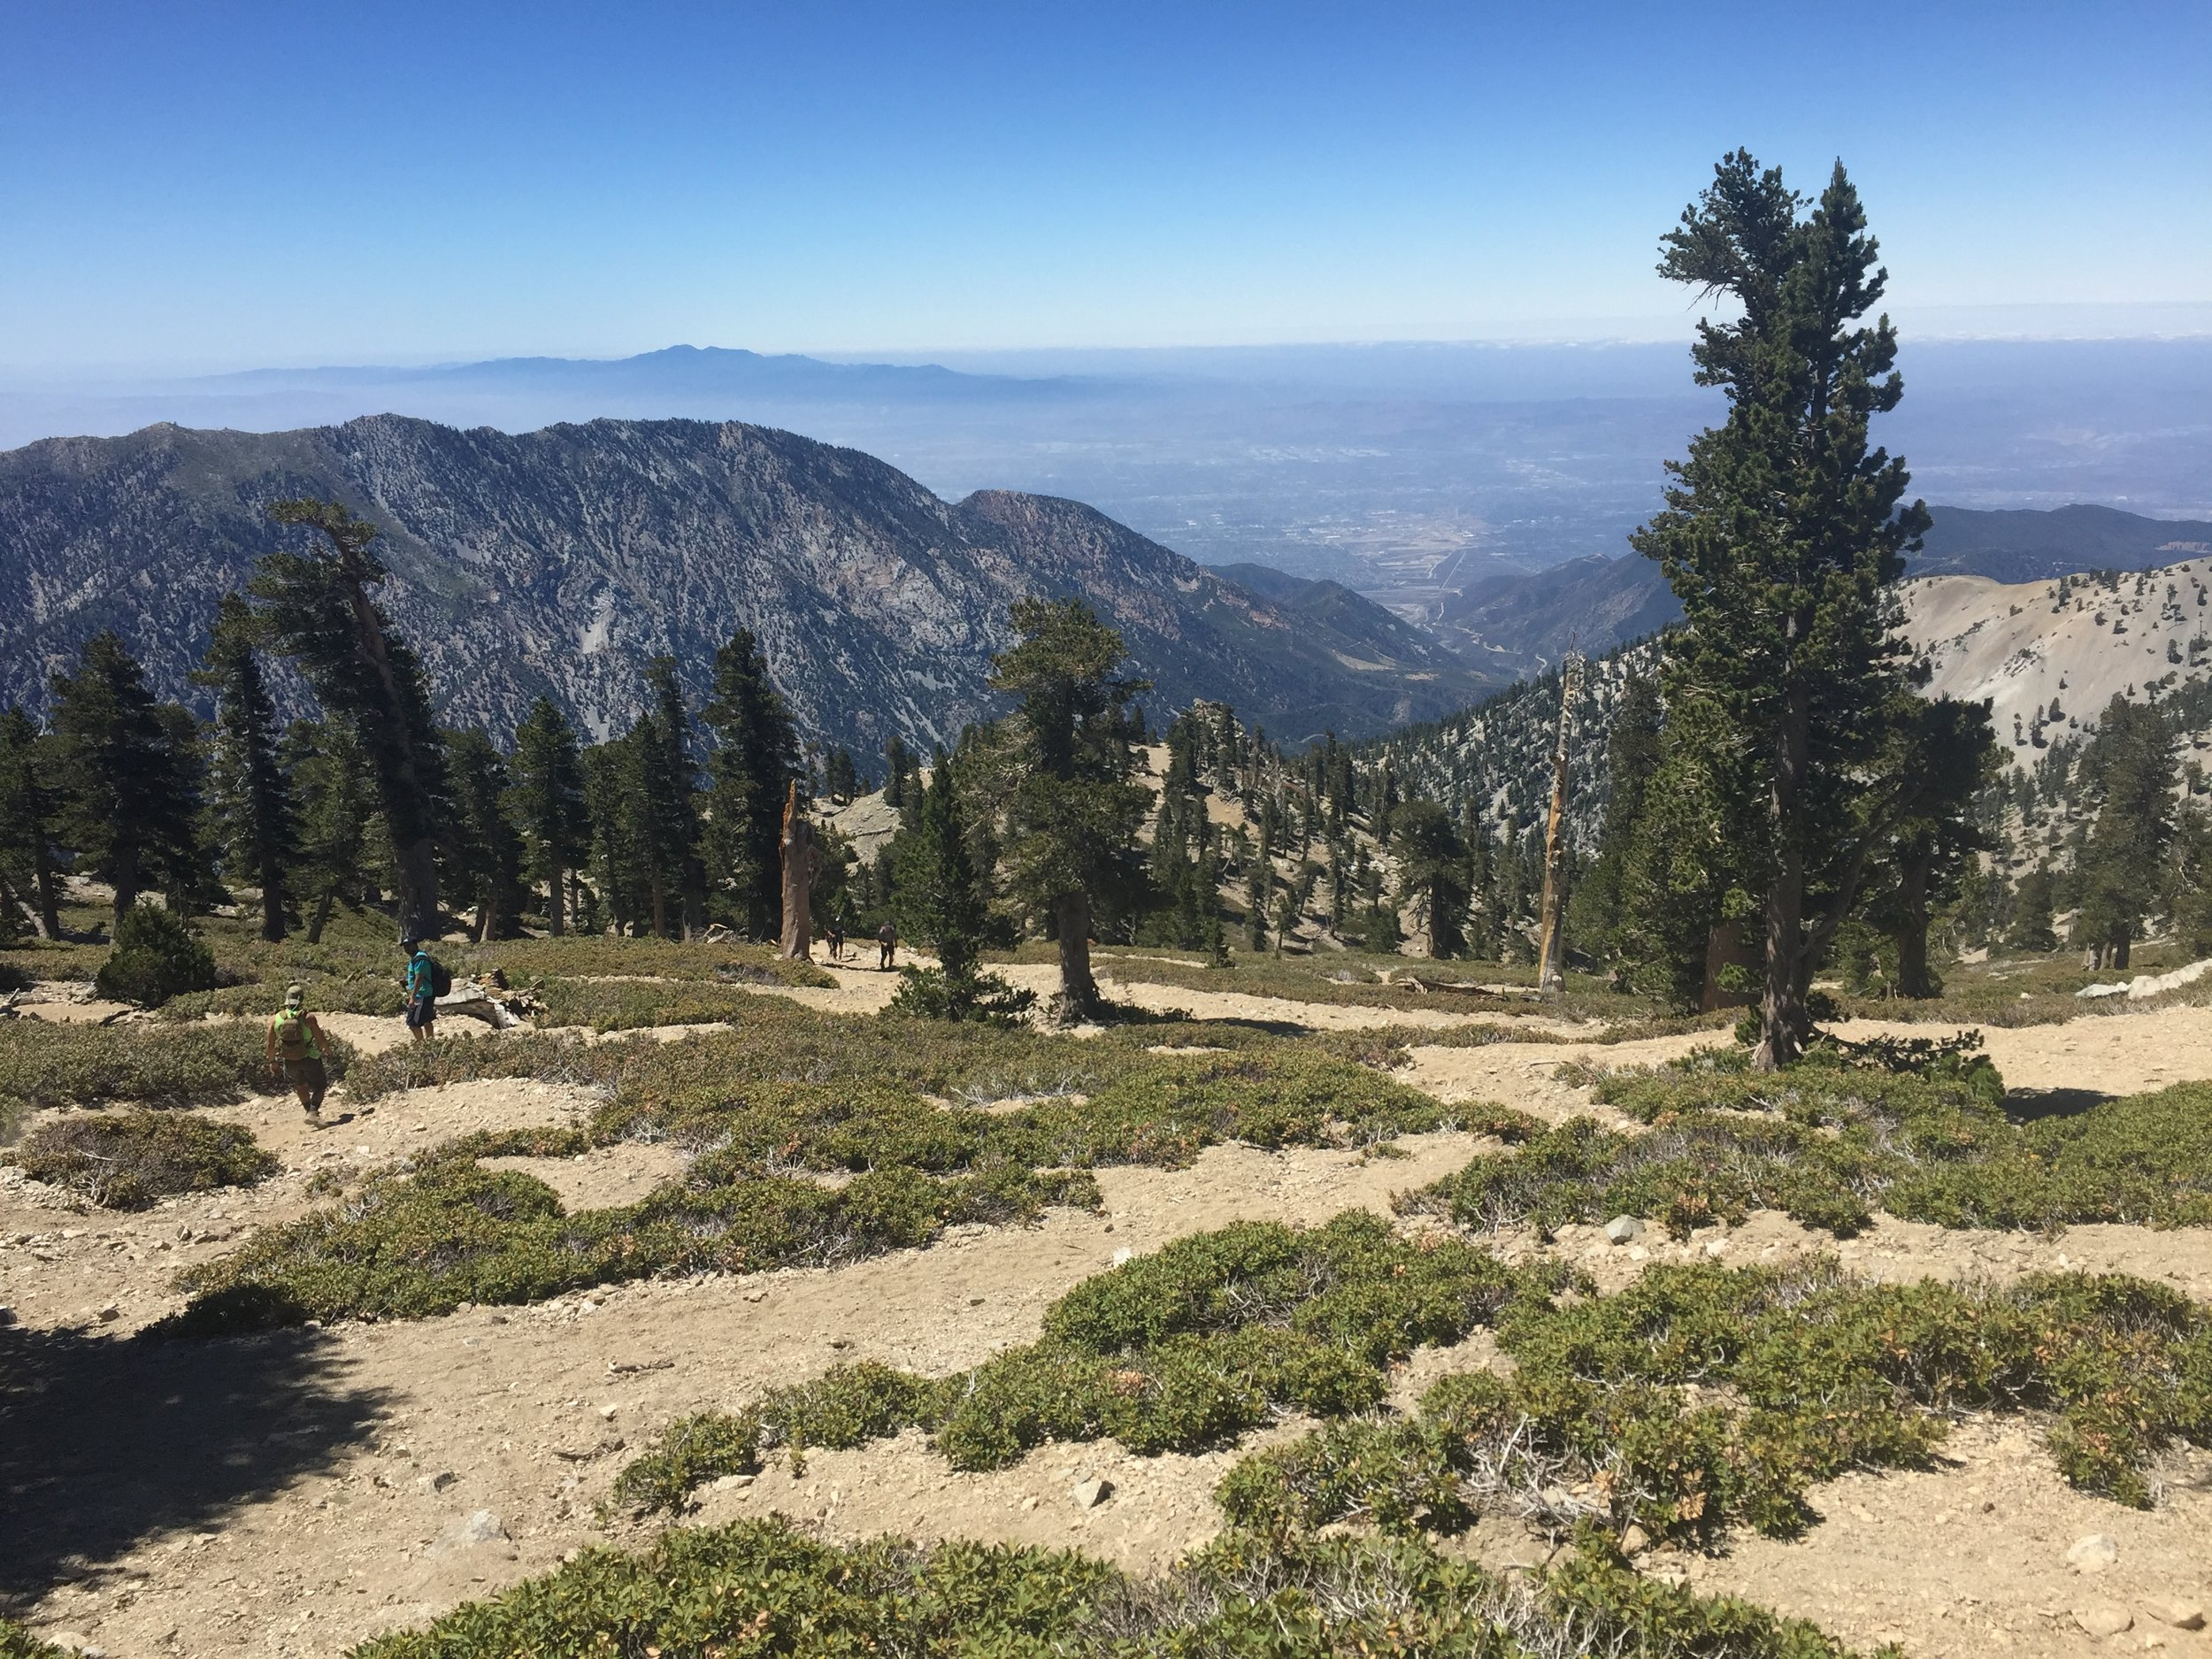 Mt. Baldy, Los Angeles County